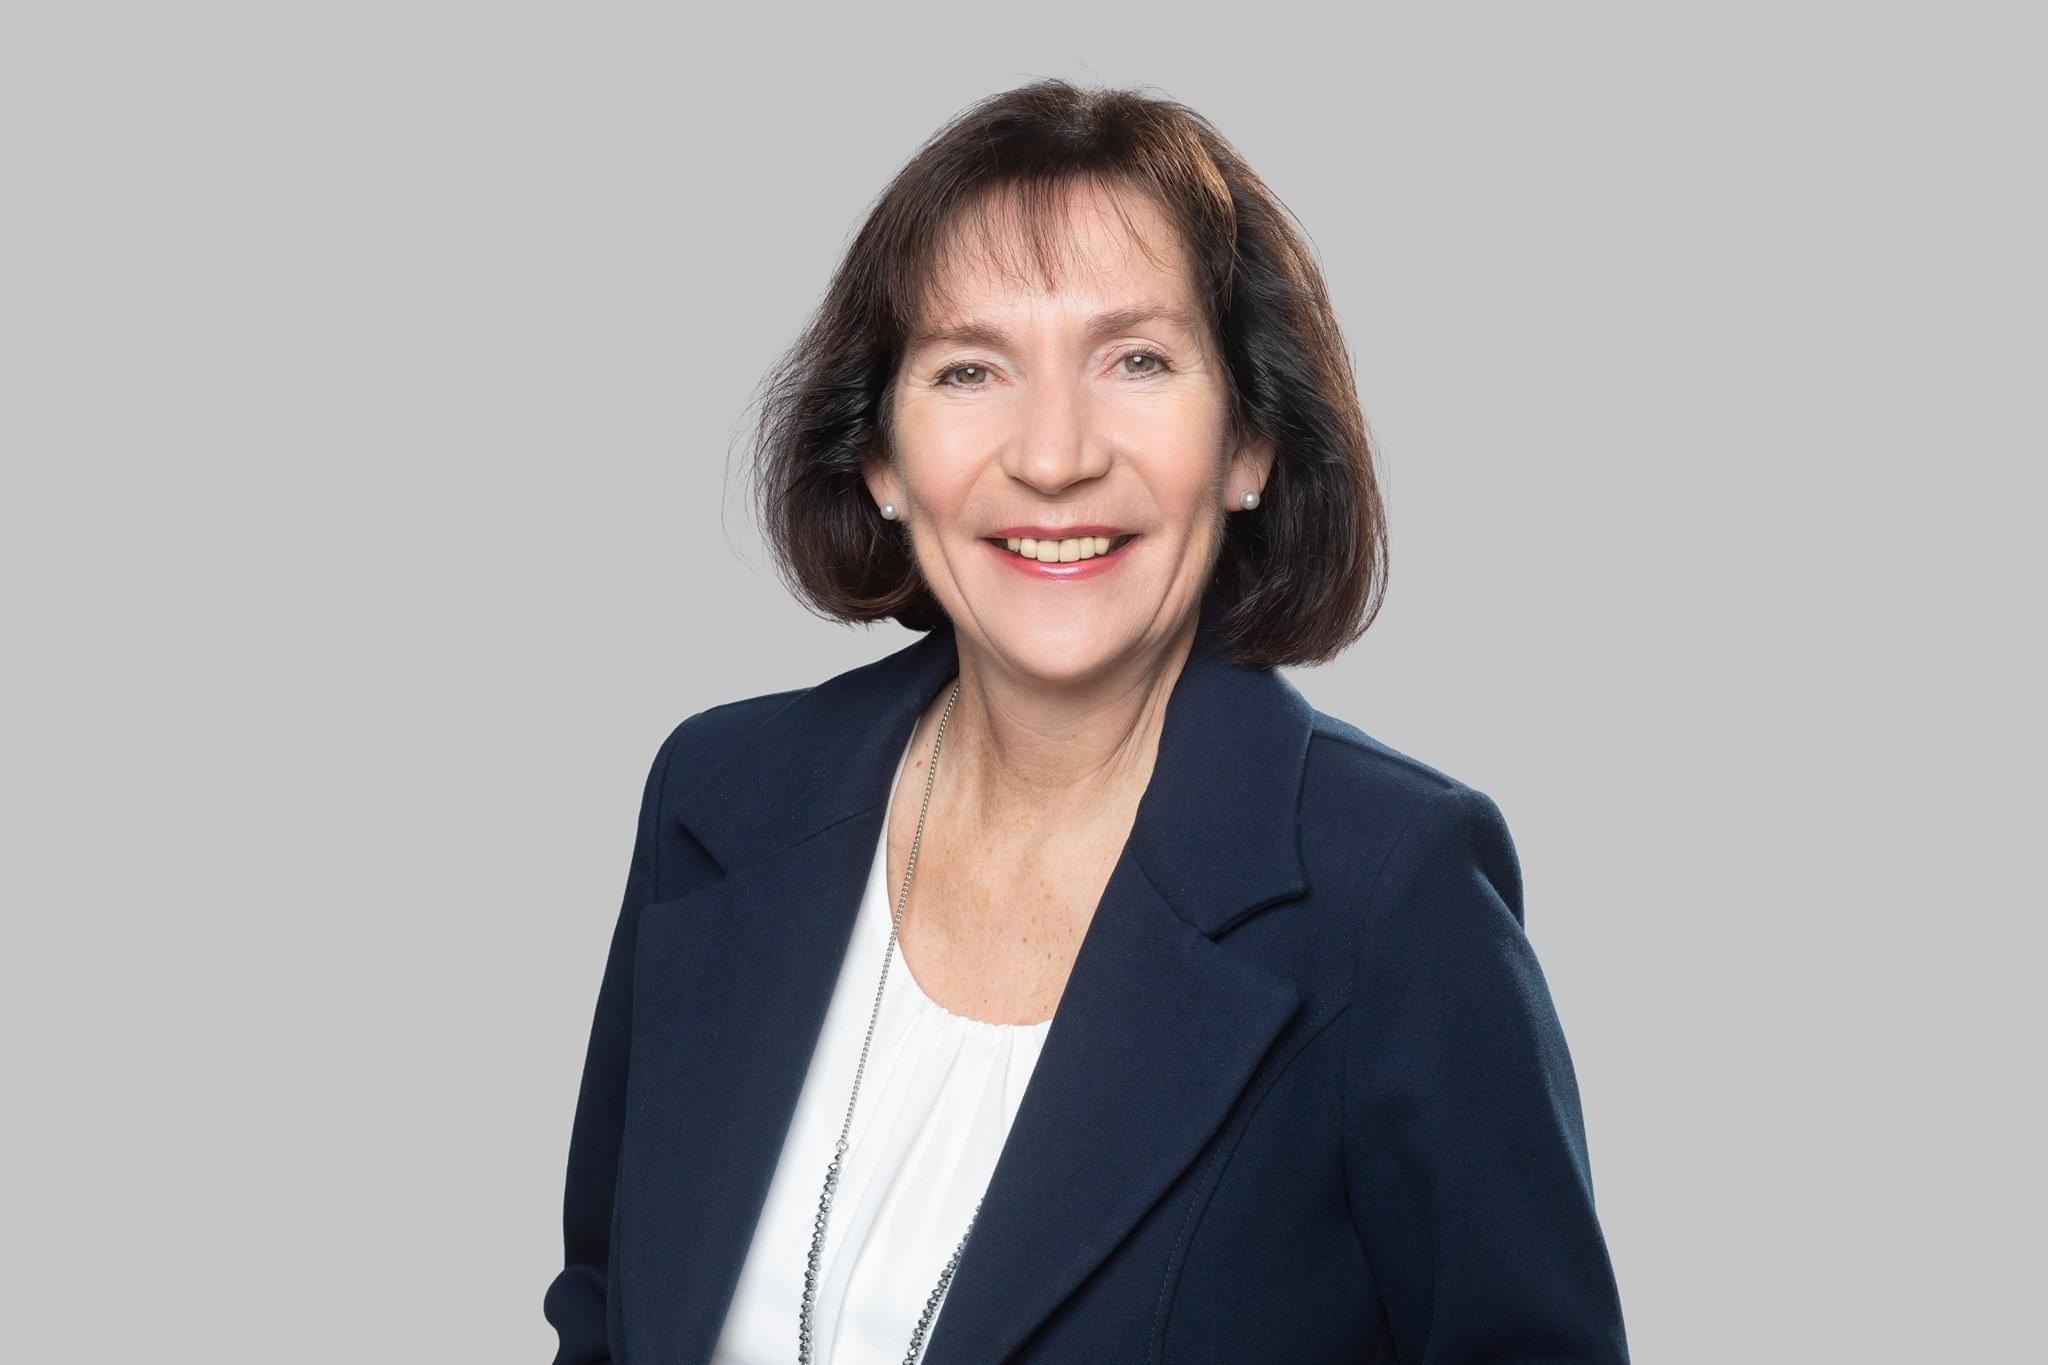 Sabine Kretschmer